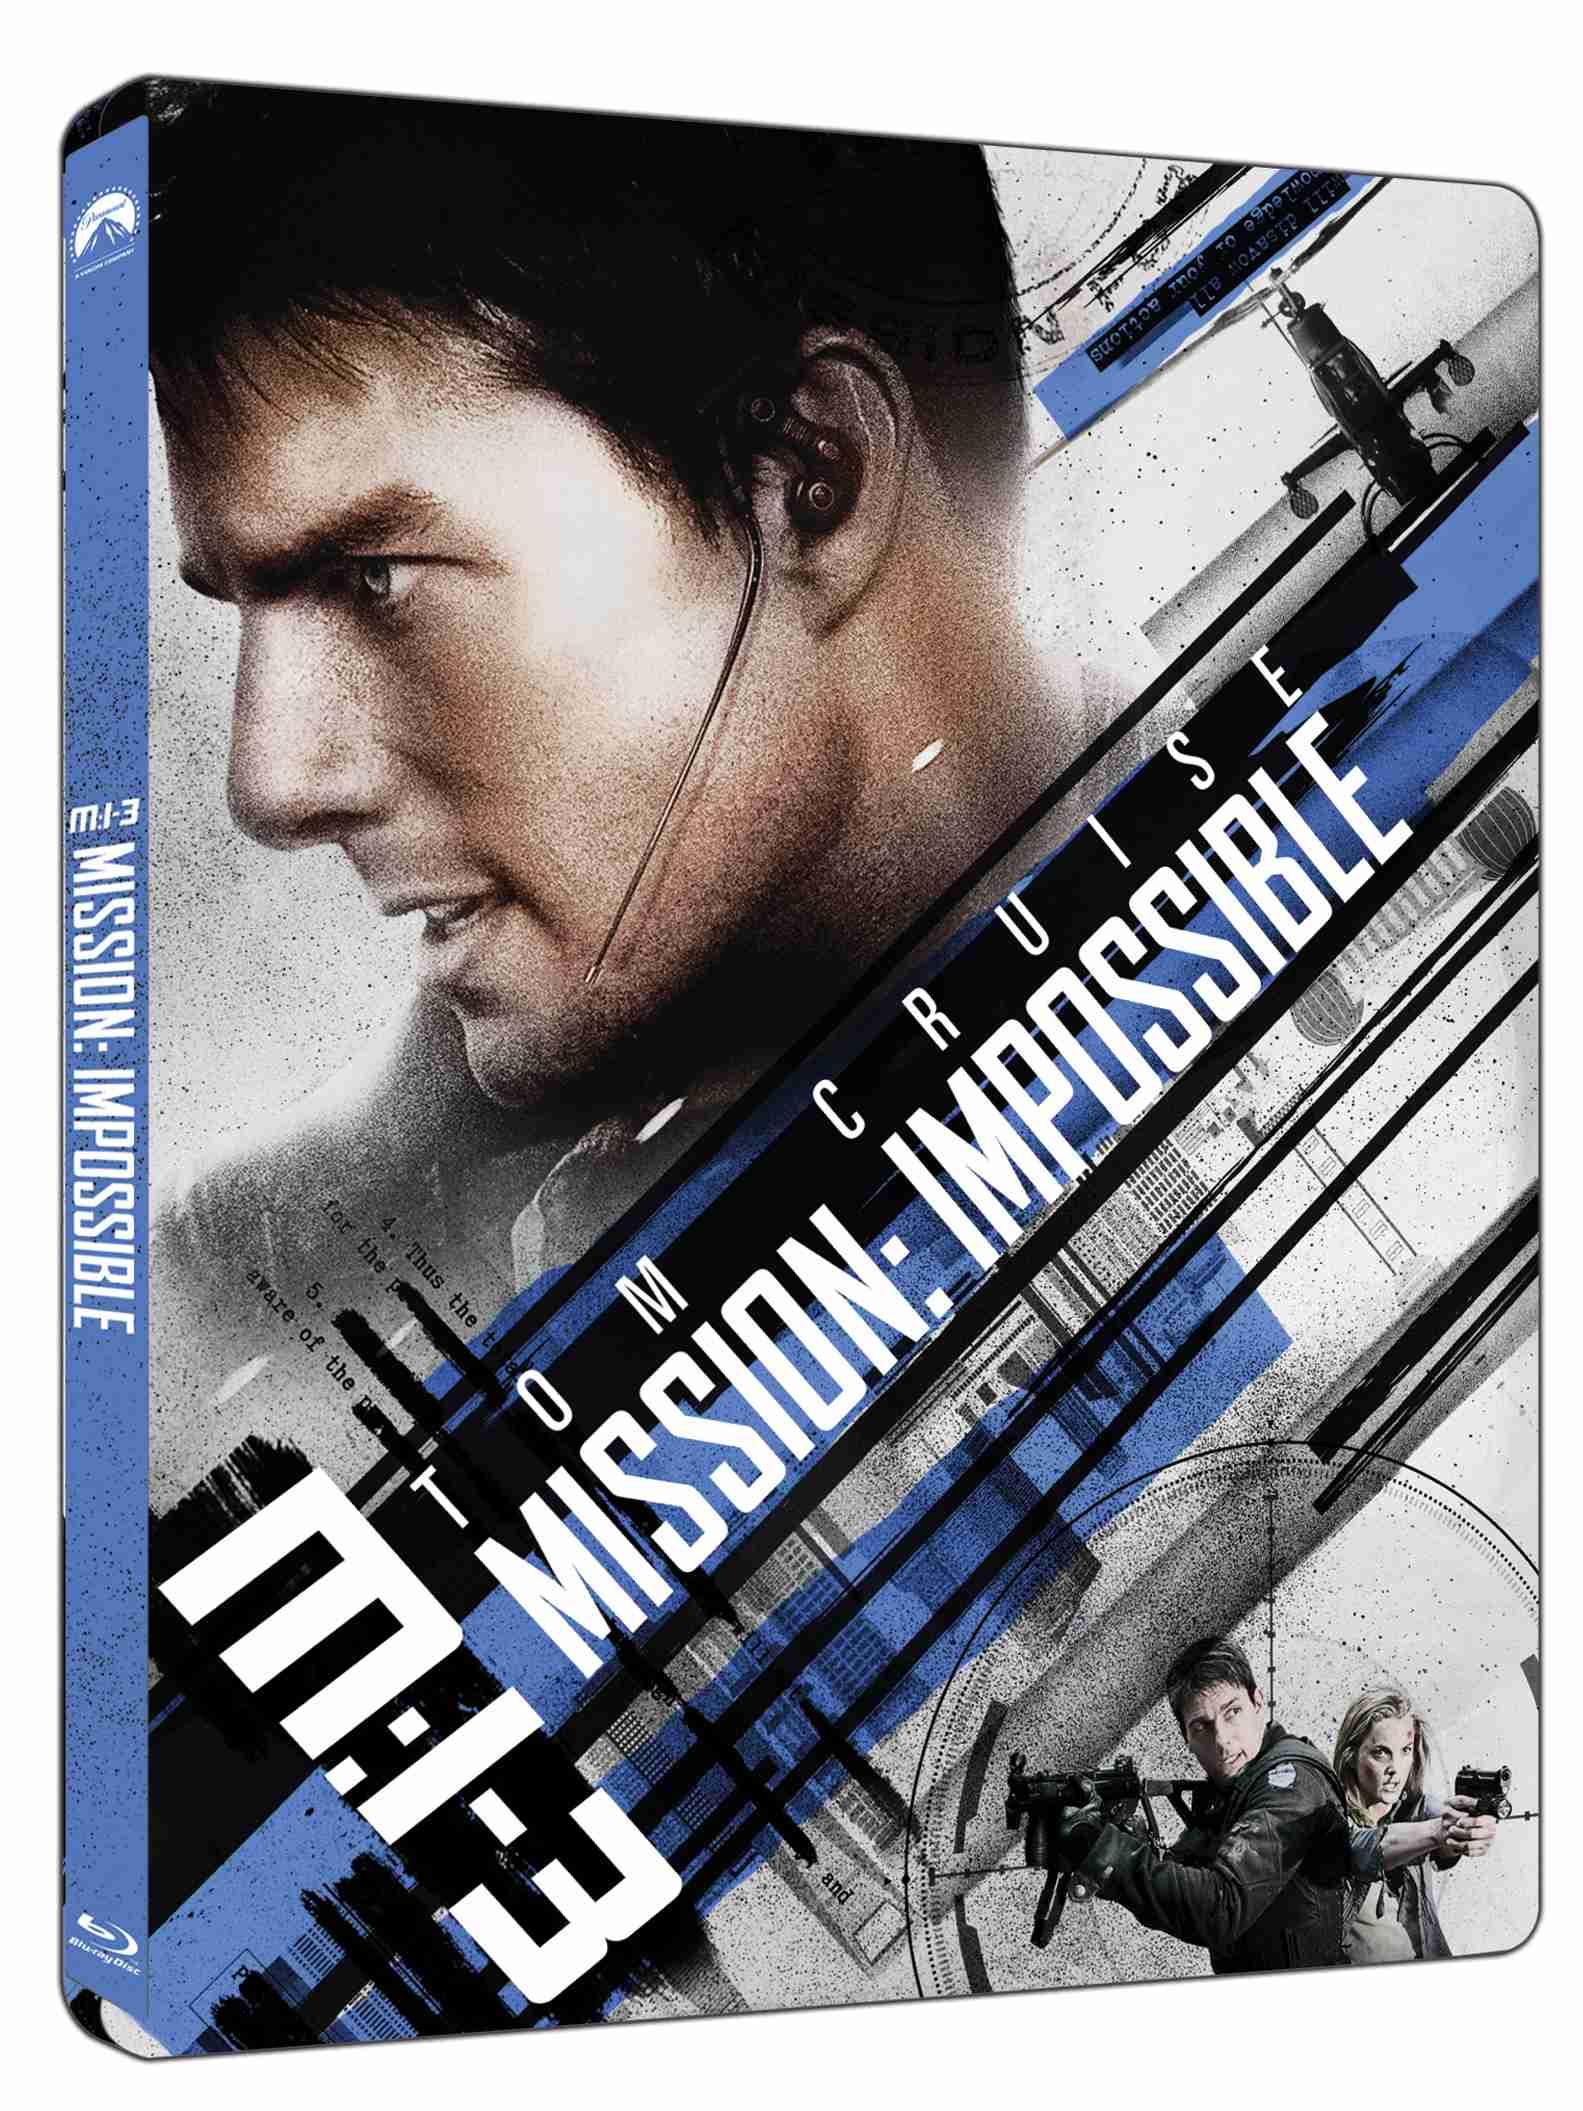 Mission: Impossible 3 (4K ULTRA HD) Steelbook - UHD Blu-ray + Blu-ray (2 BD)